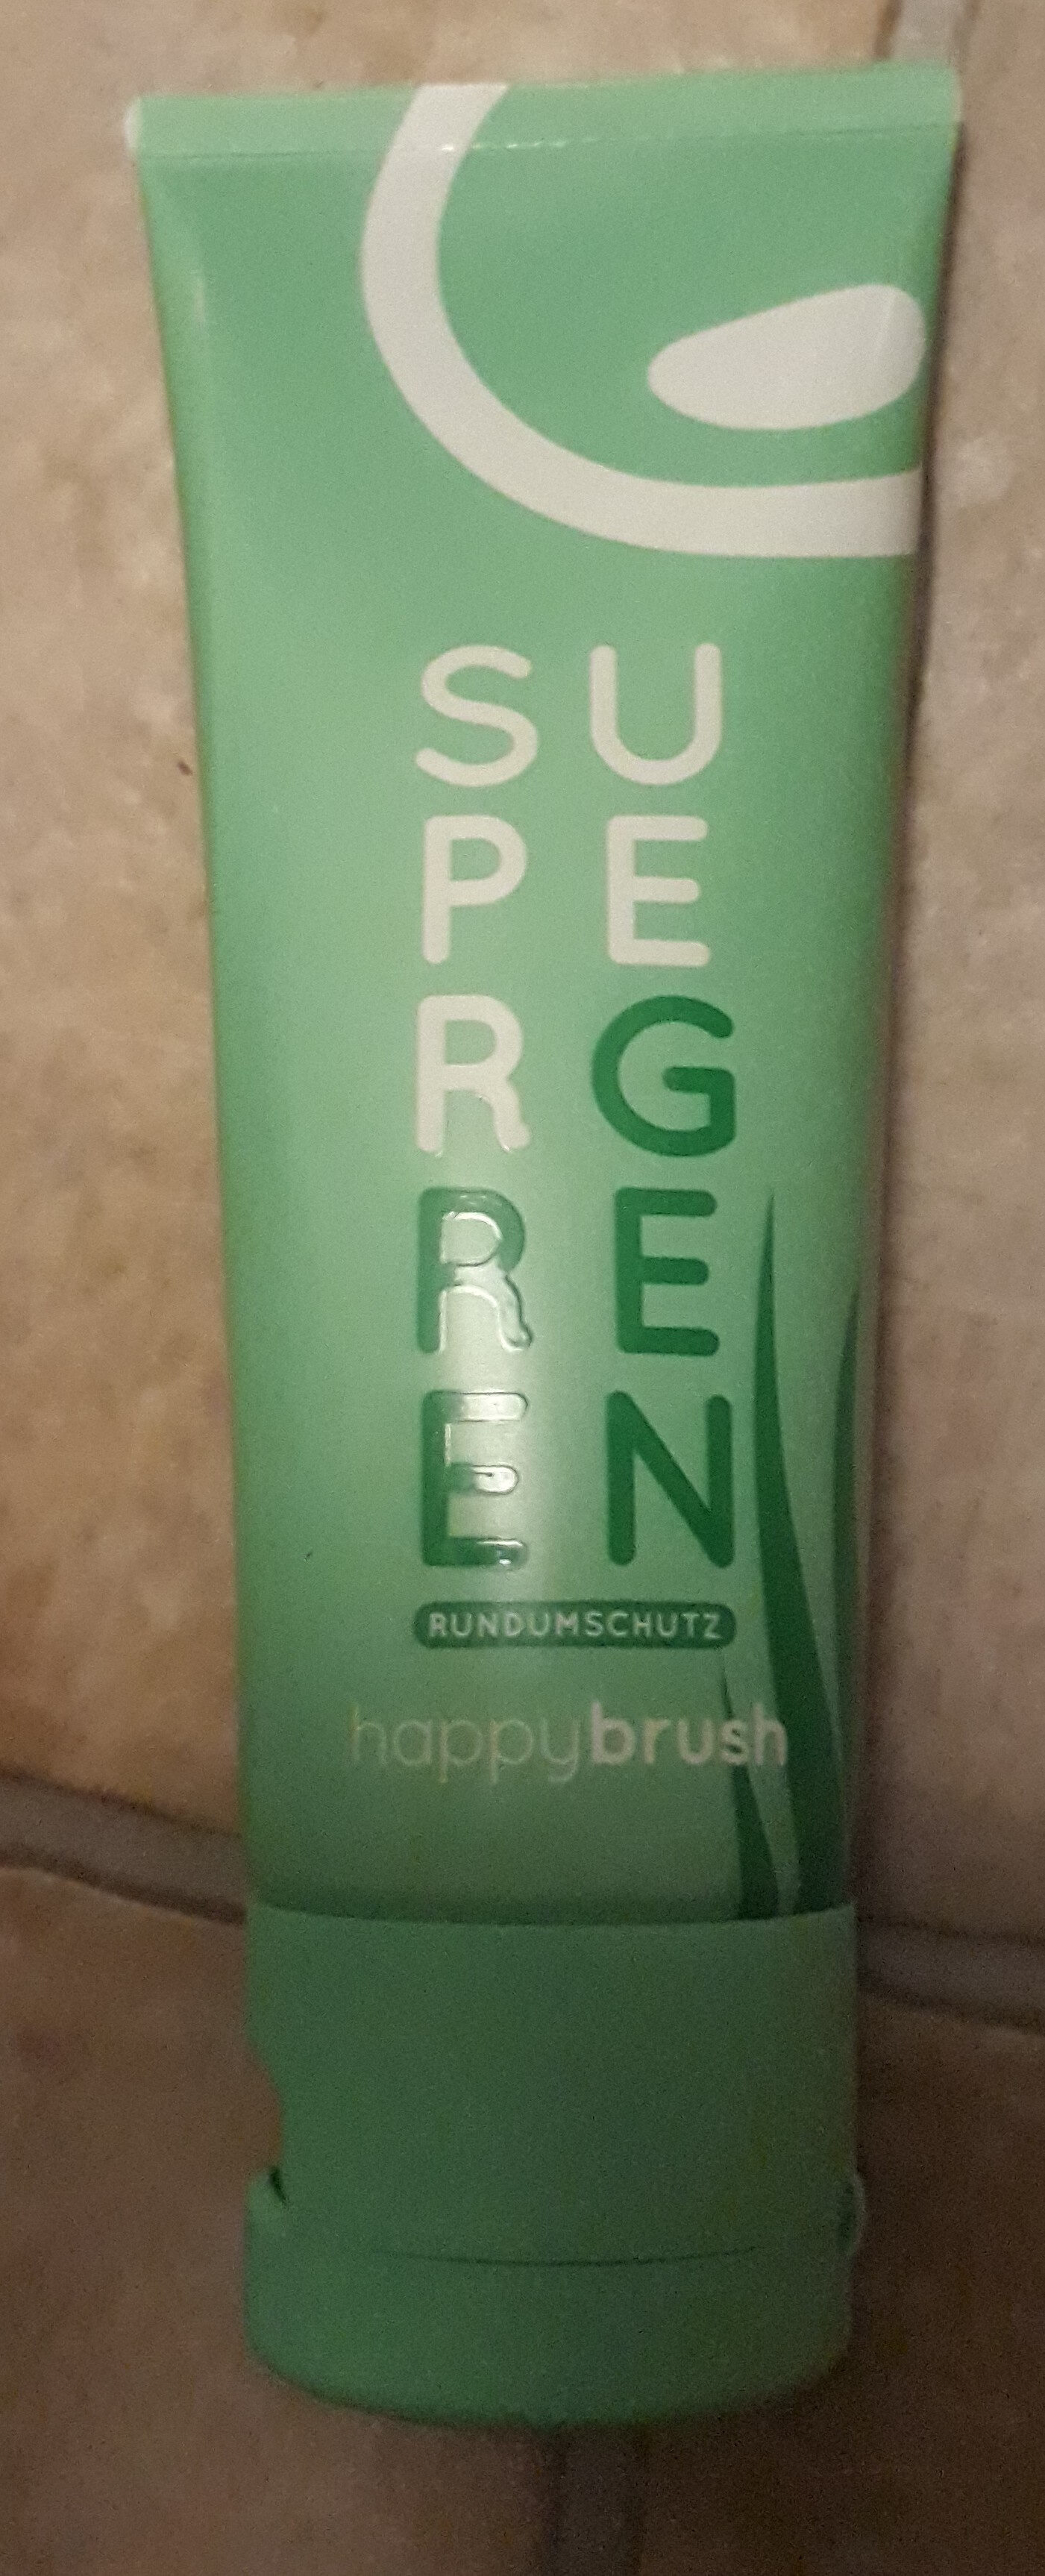 super green Zahnpasta - Product - de